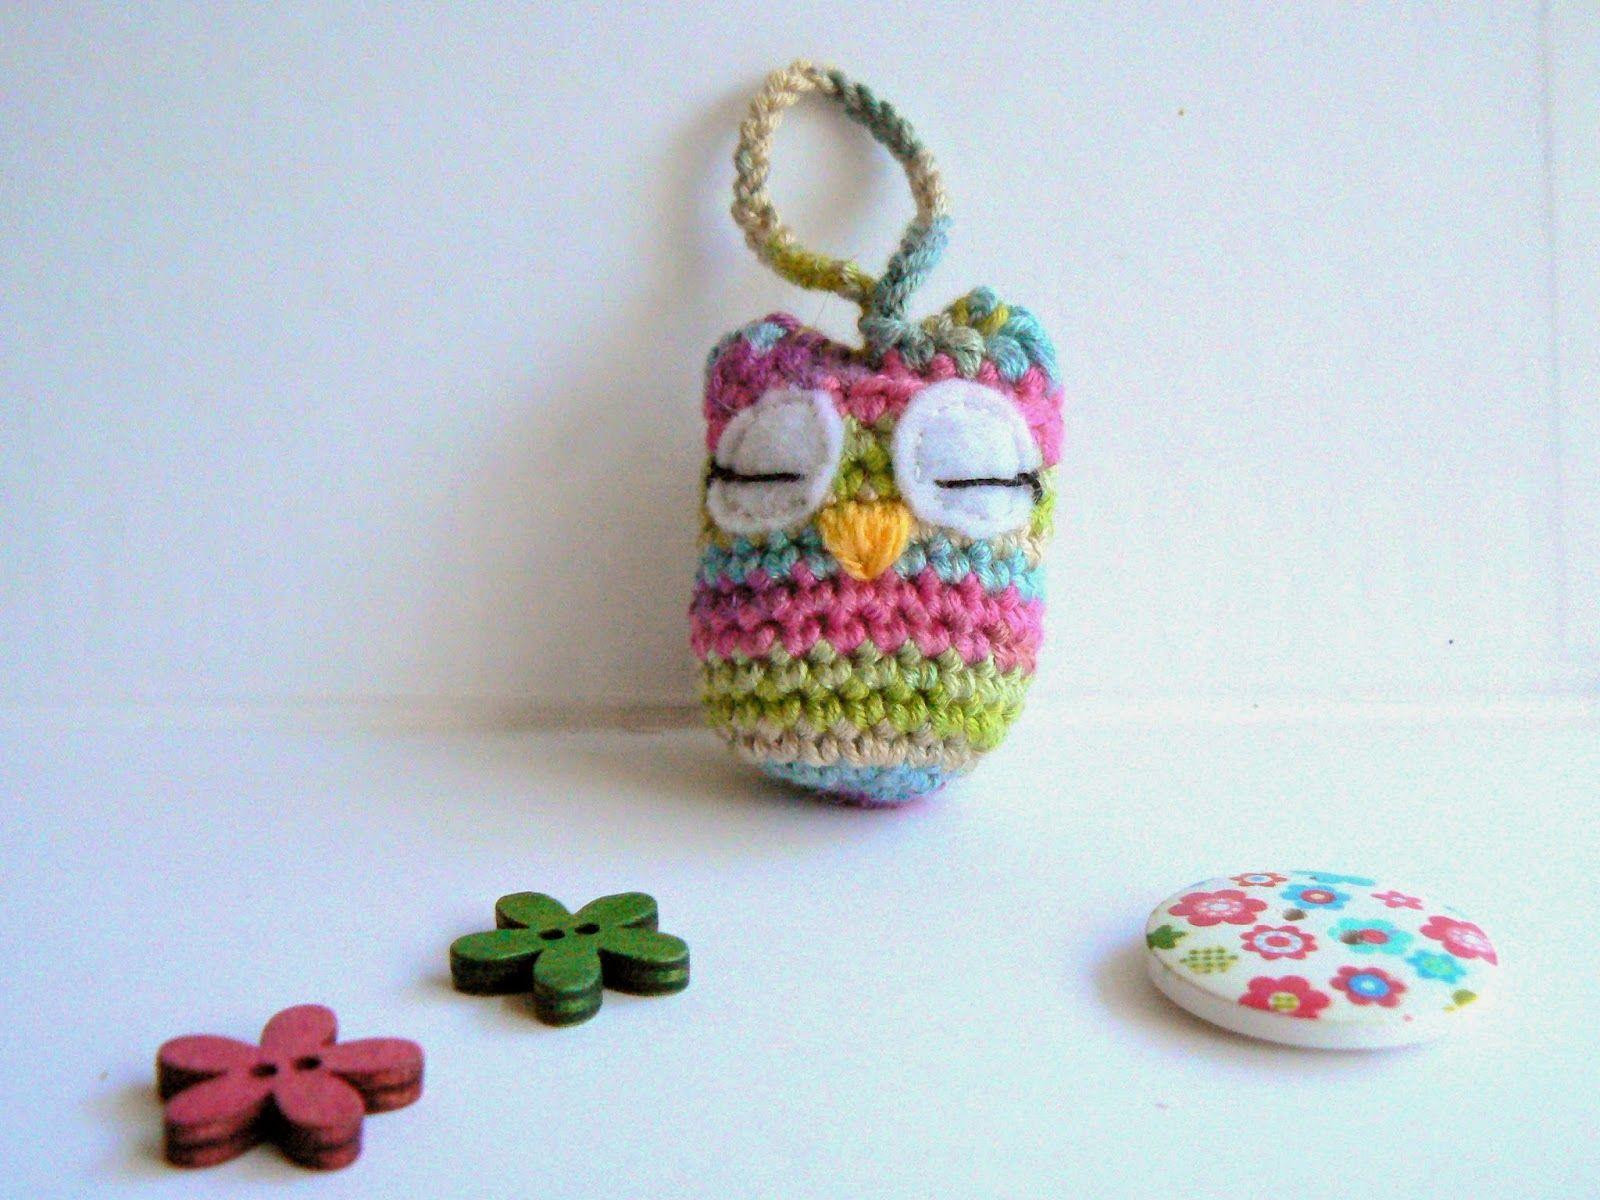 Free Amigurumi Patterns Uk : Little crochet a little owl free pattern thanks so xox